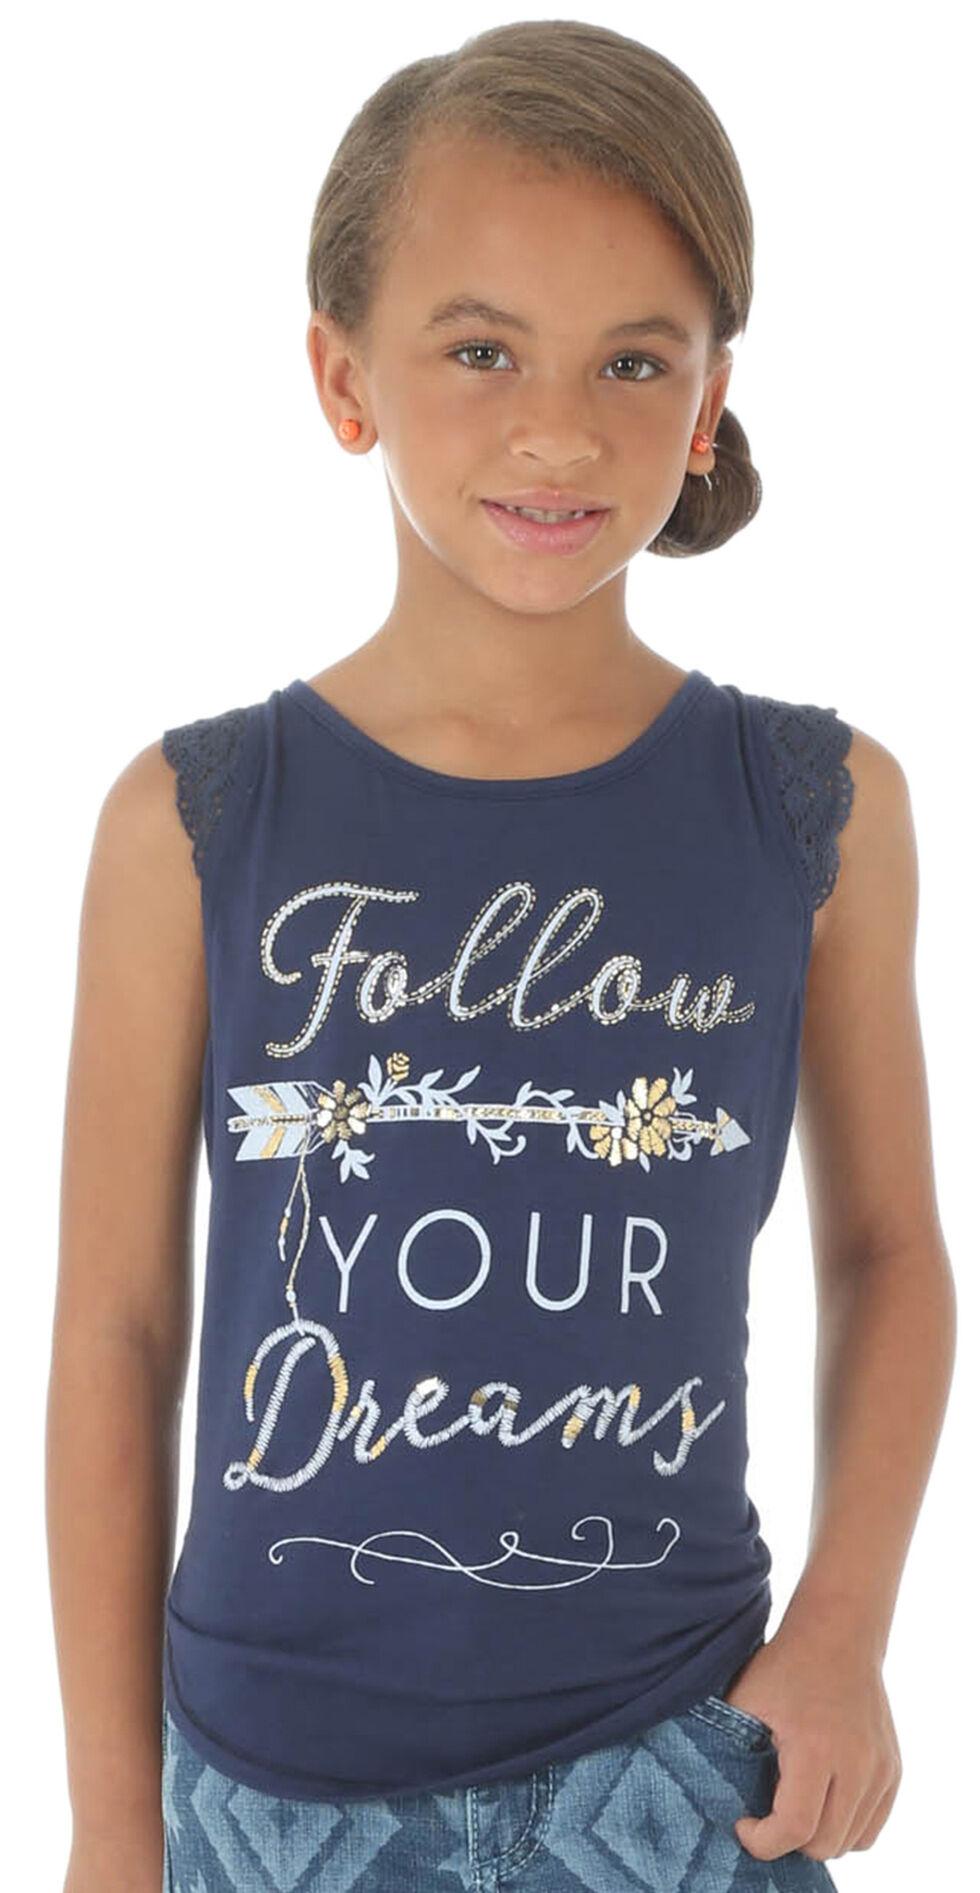 Wrangler Girls' Follow Your Dreams Top, Navy, hi-res